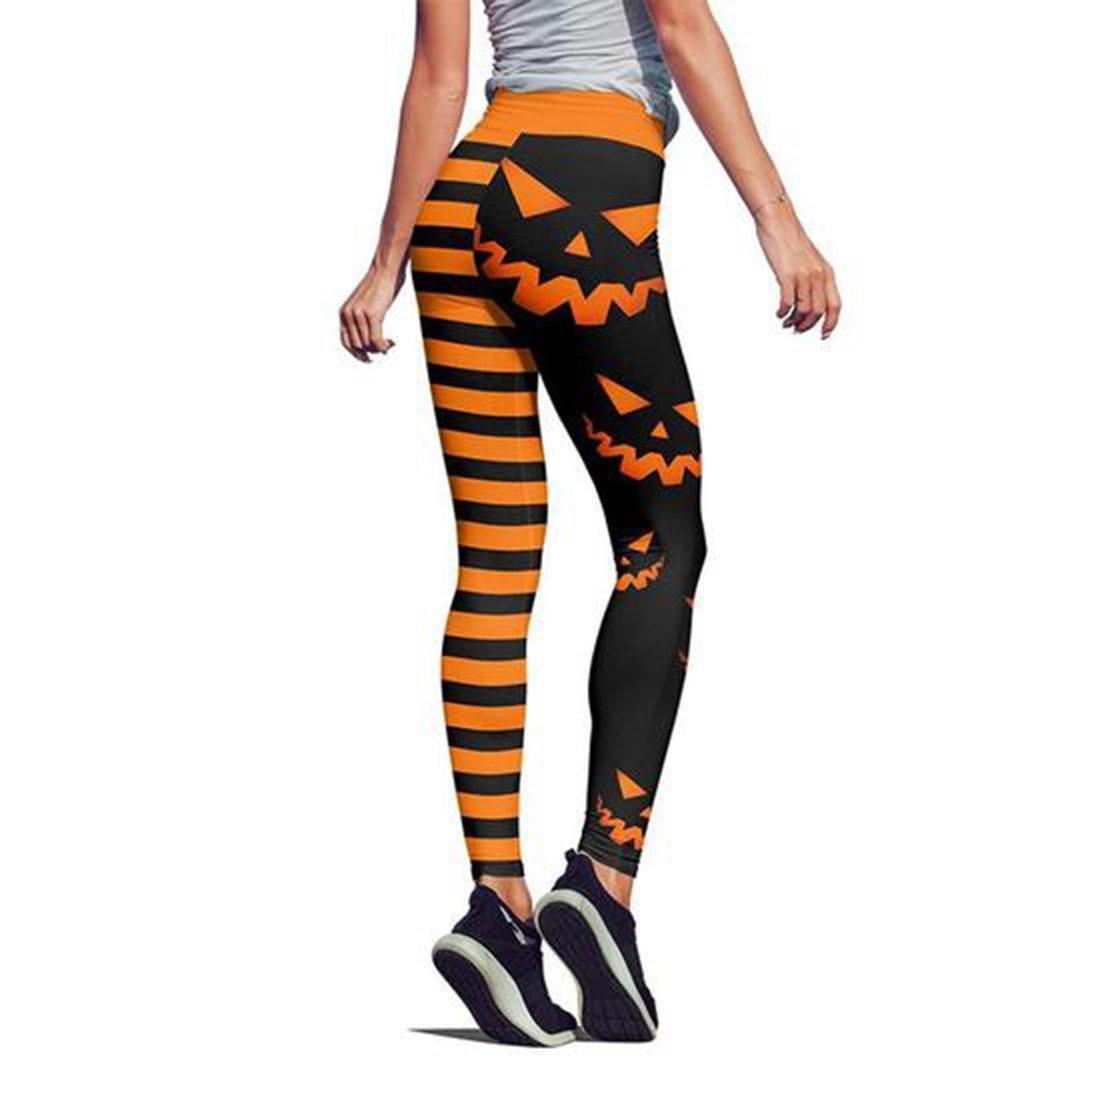 Pumpkin hallowstripes high waist legging orange - back